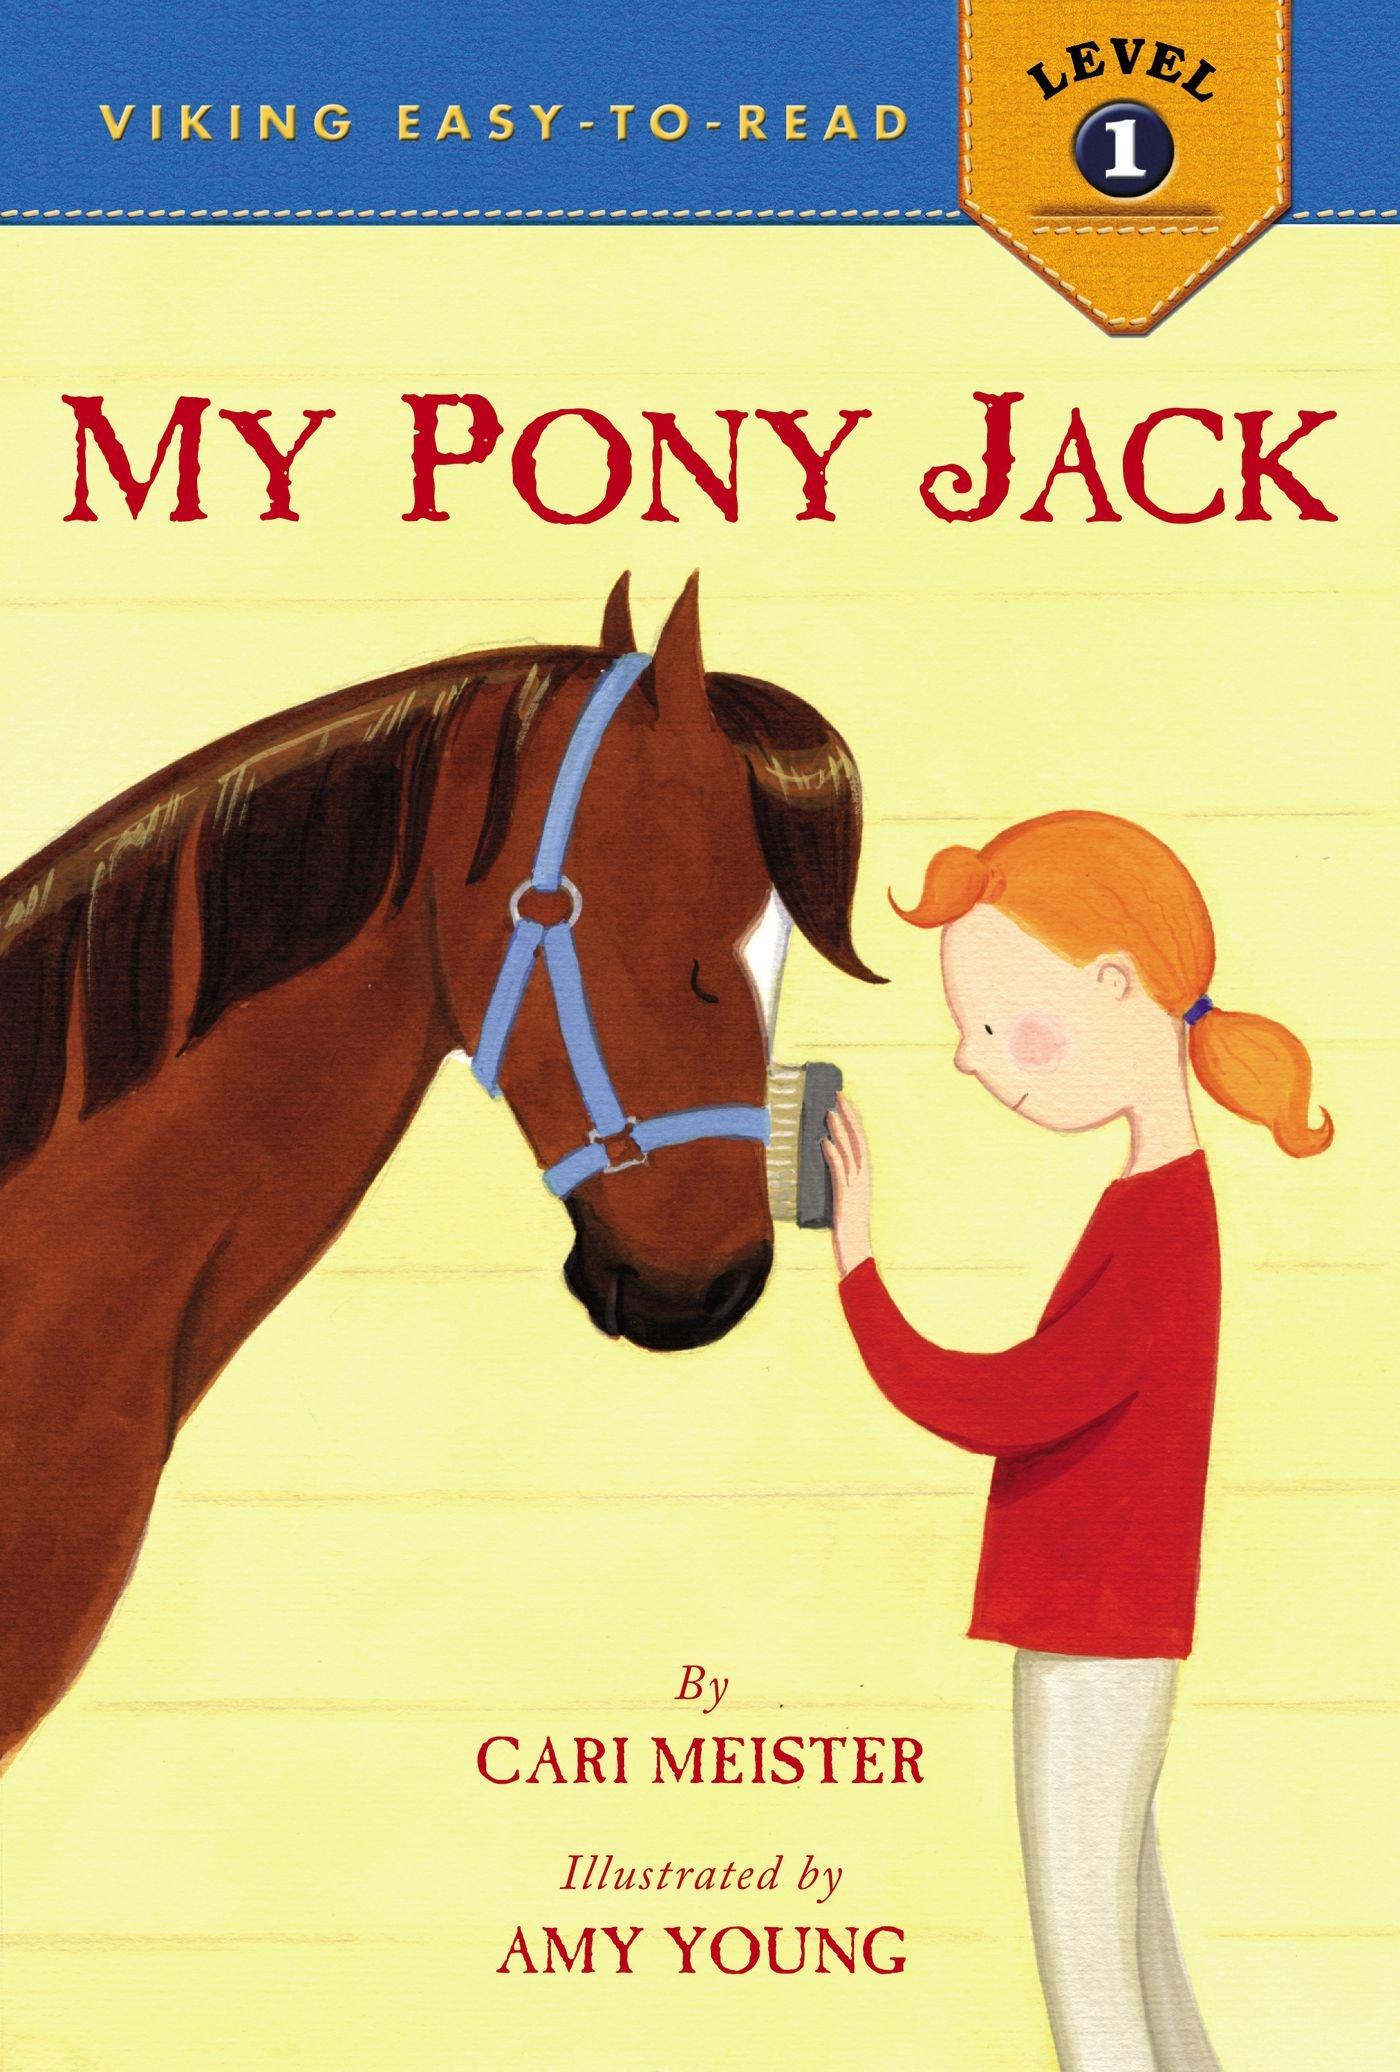 My Pony Jack (Viking Easy-to-Read) by Viking Juvenile